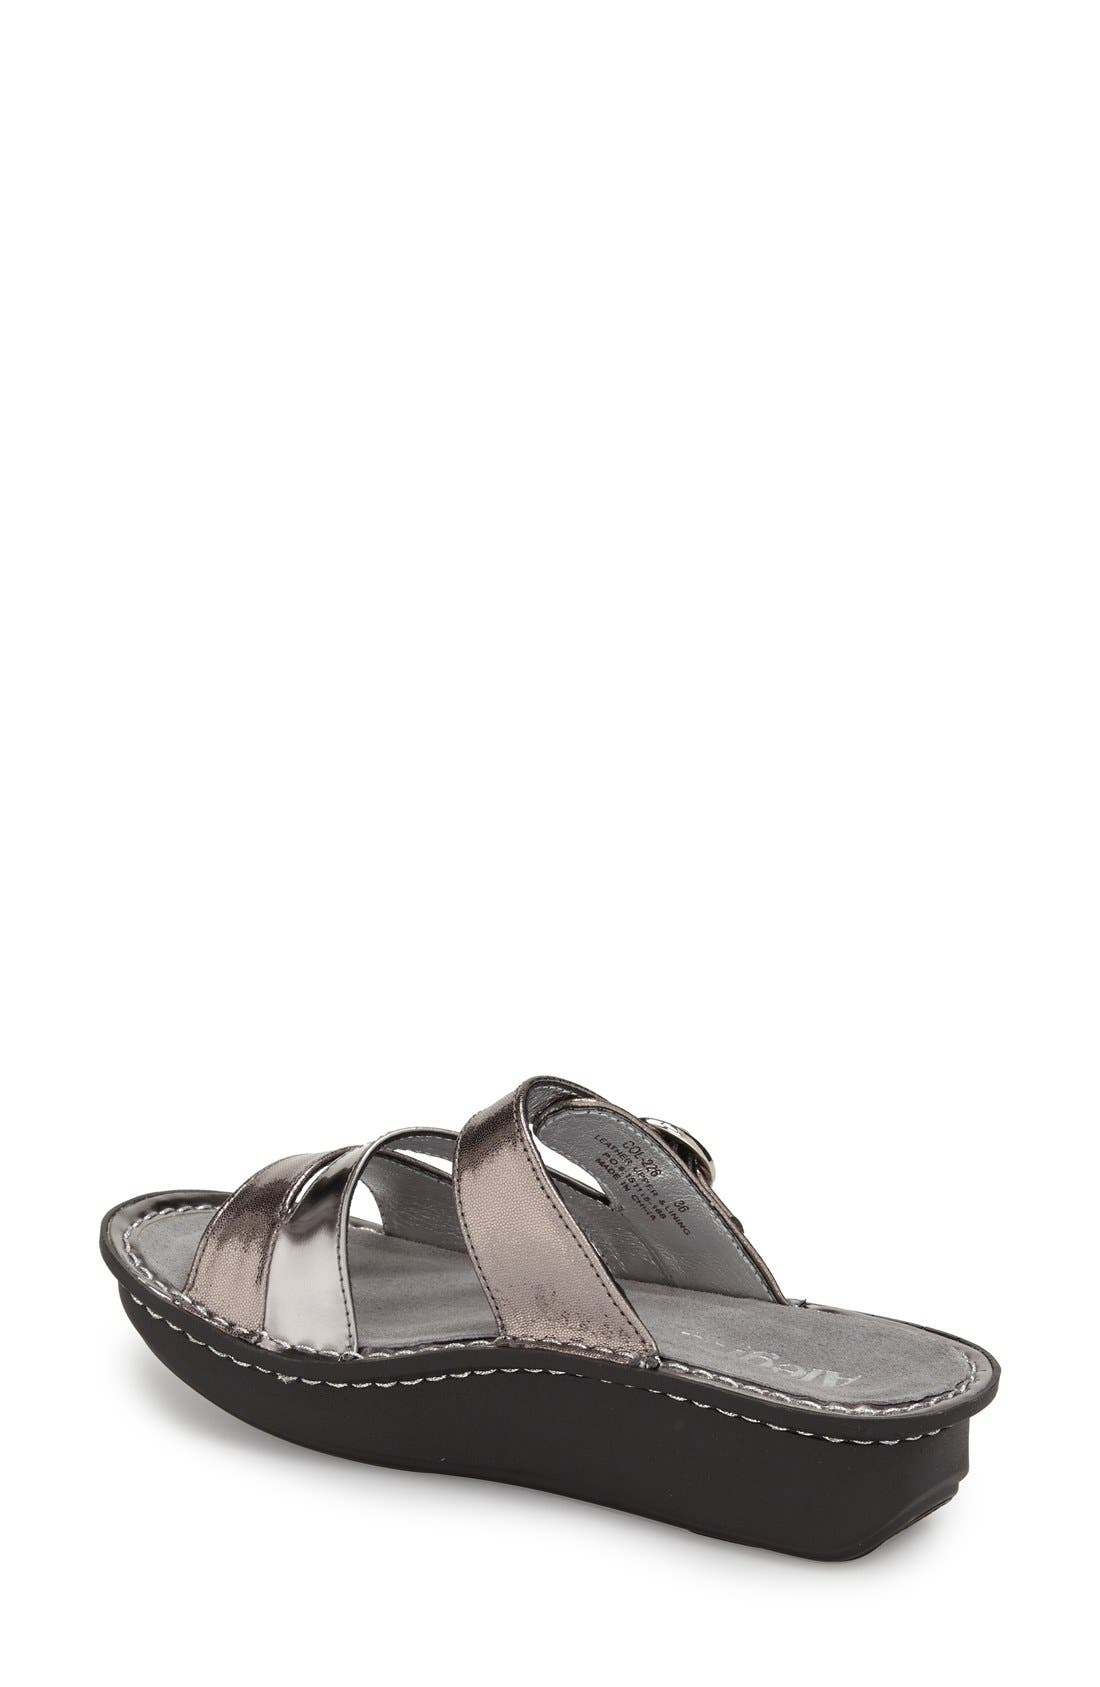 'Colette' Platform Sandal,                             Alternate thumbnail 22, color,